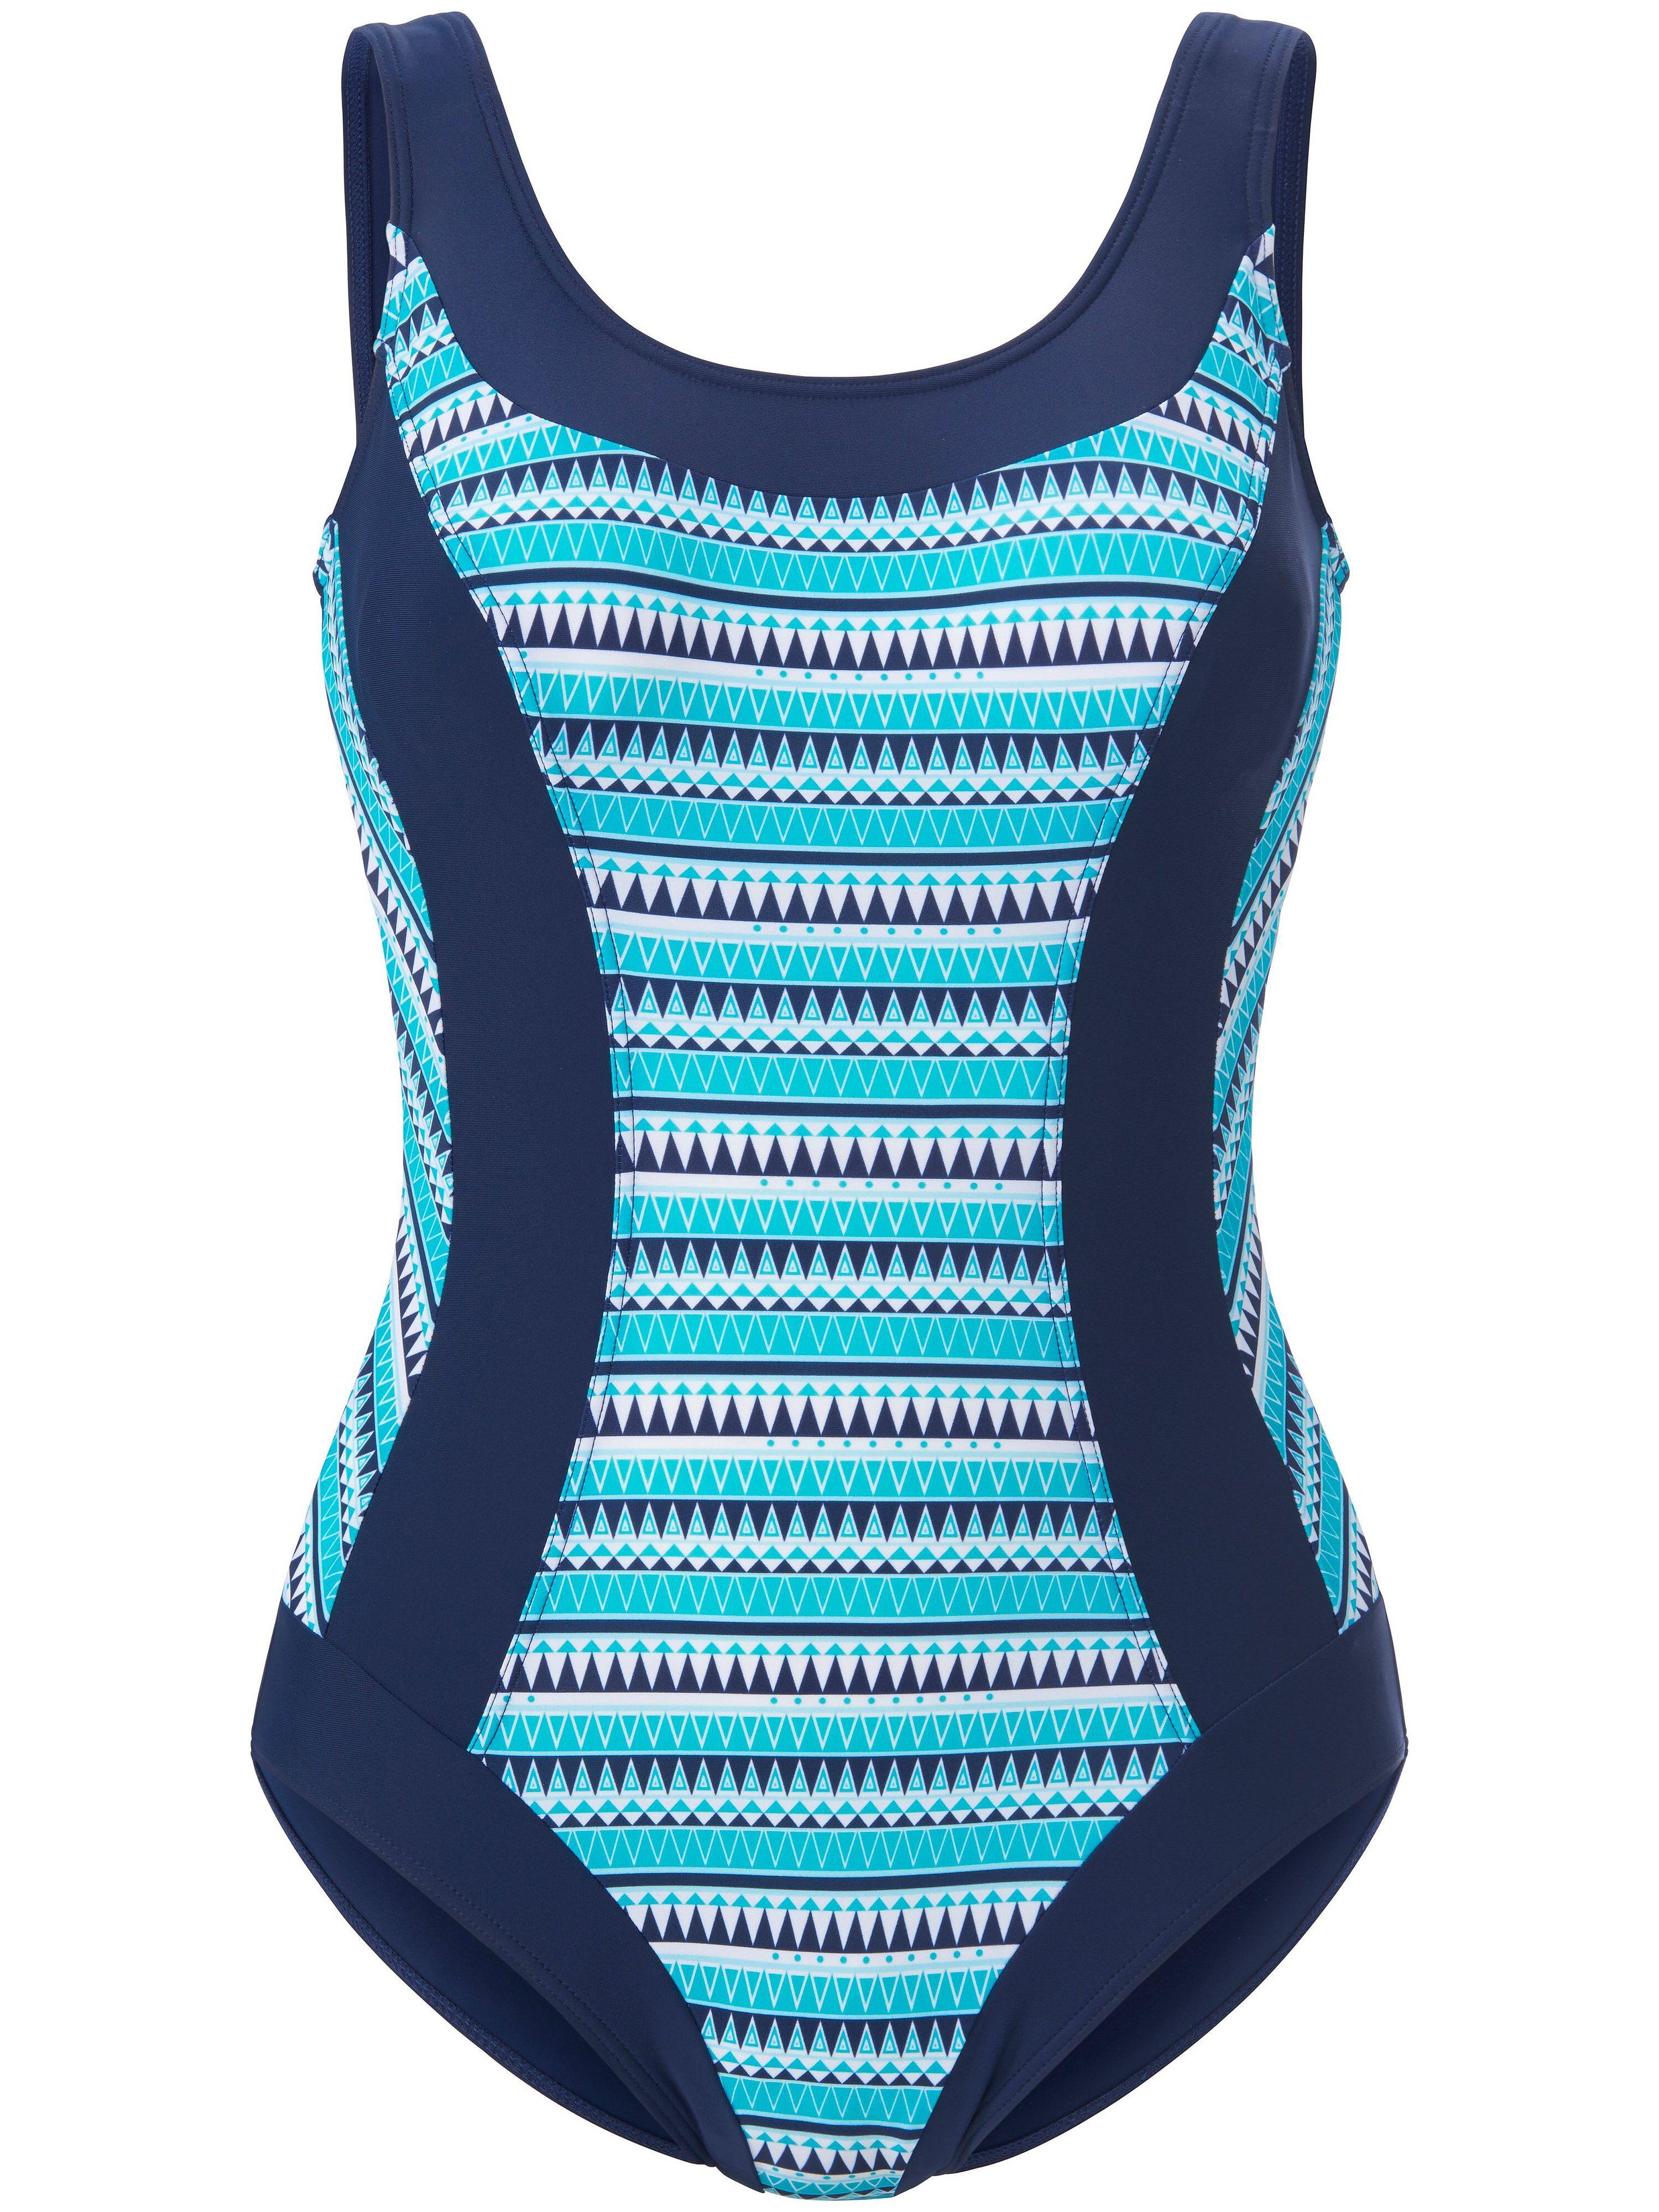 Sunmarin La maillot bain avec buste doublé  Sunmarin bleu  - Femme - 42